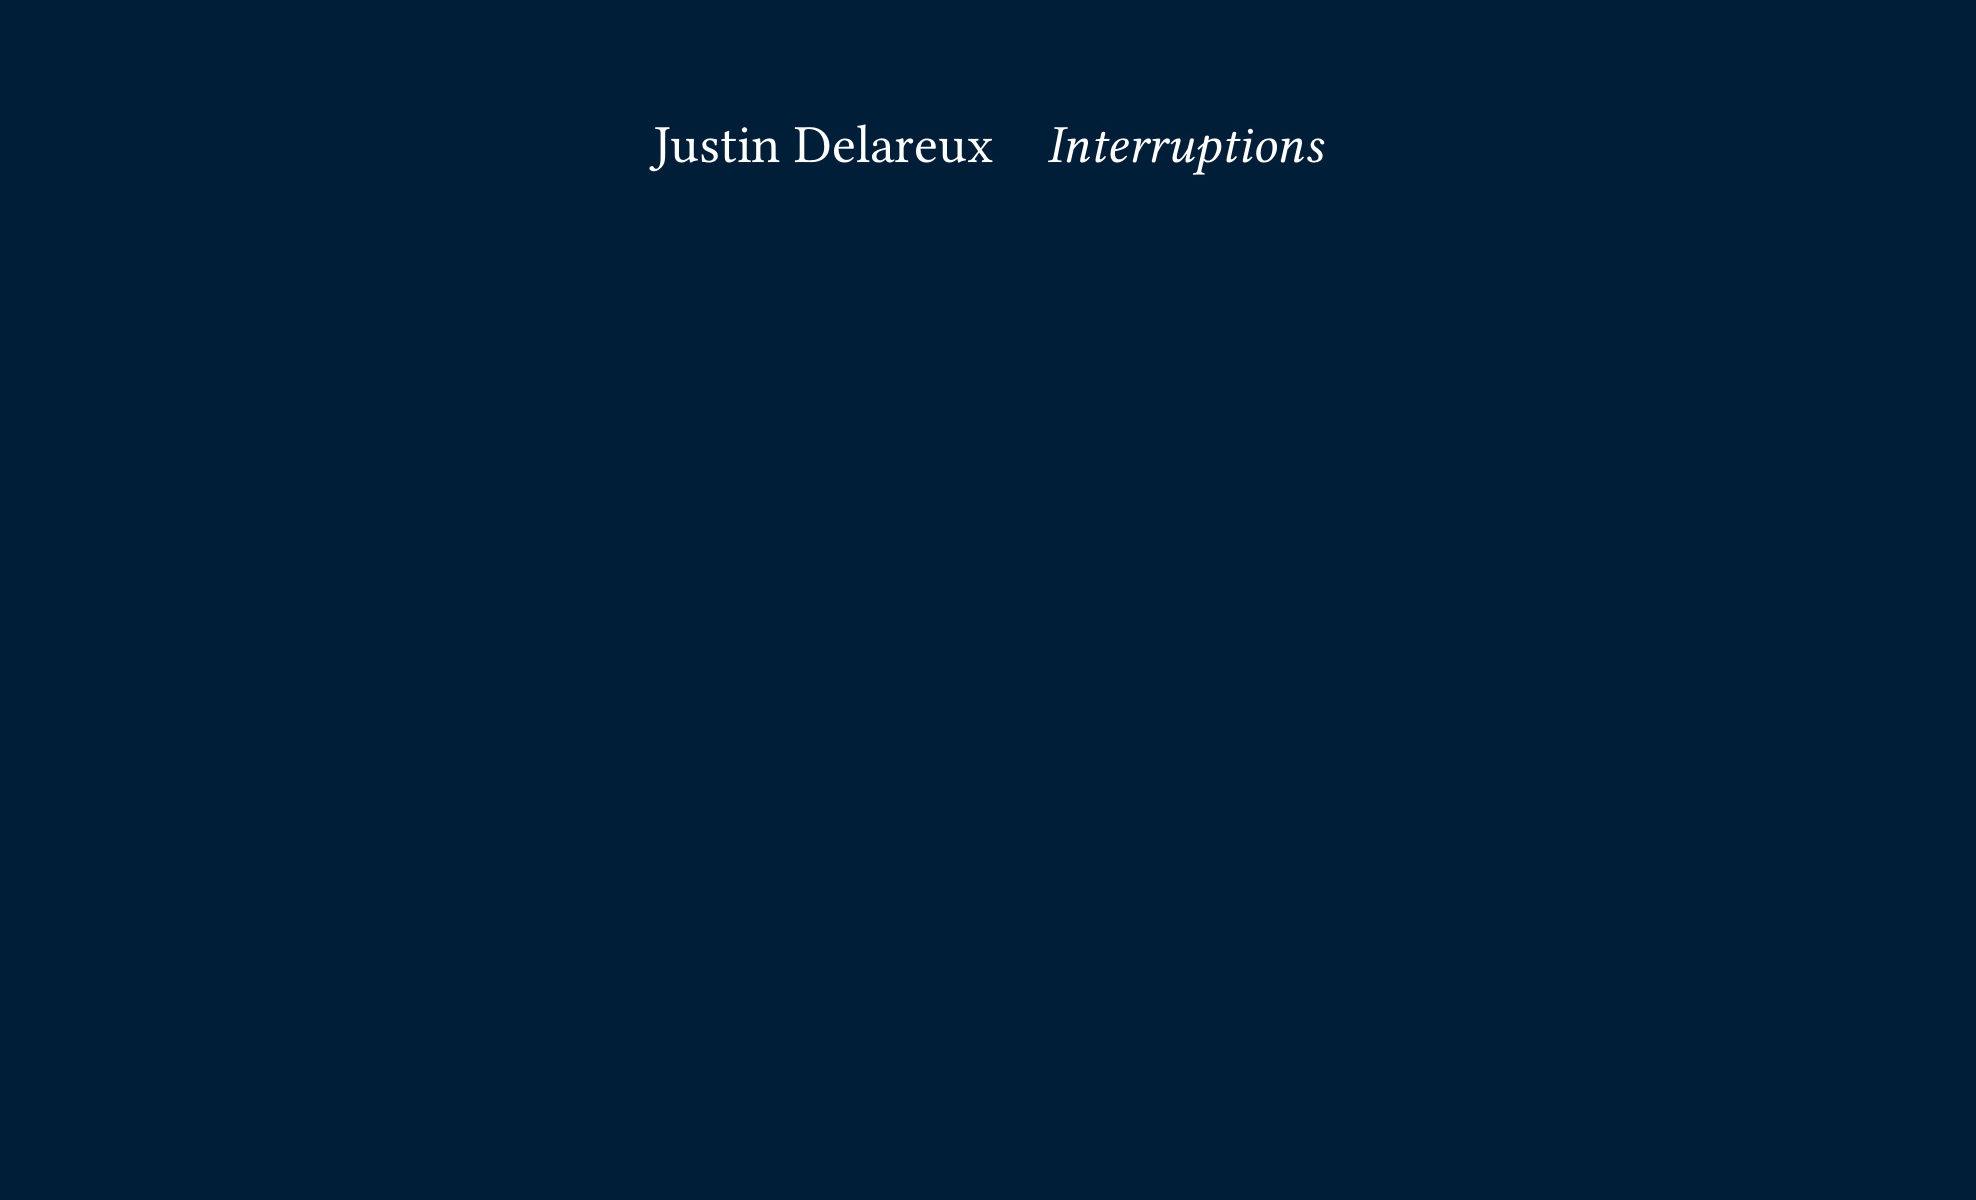 Interruptions par Justin Delareux